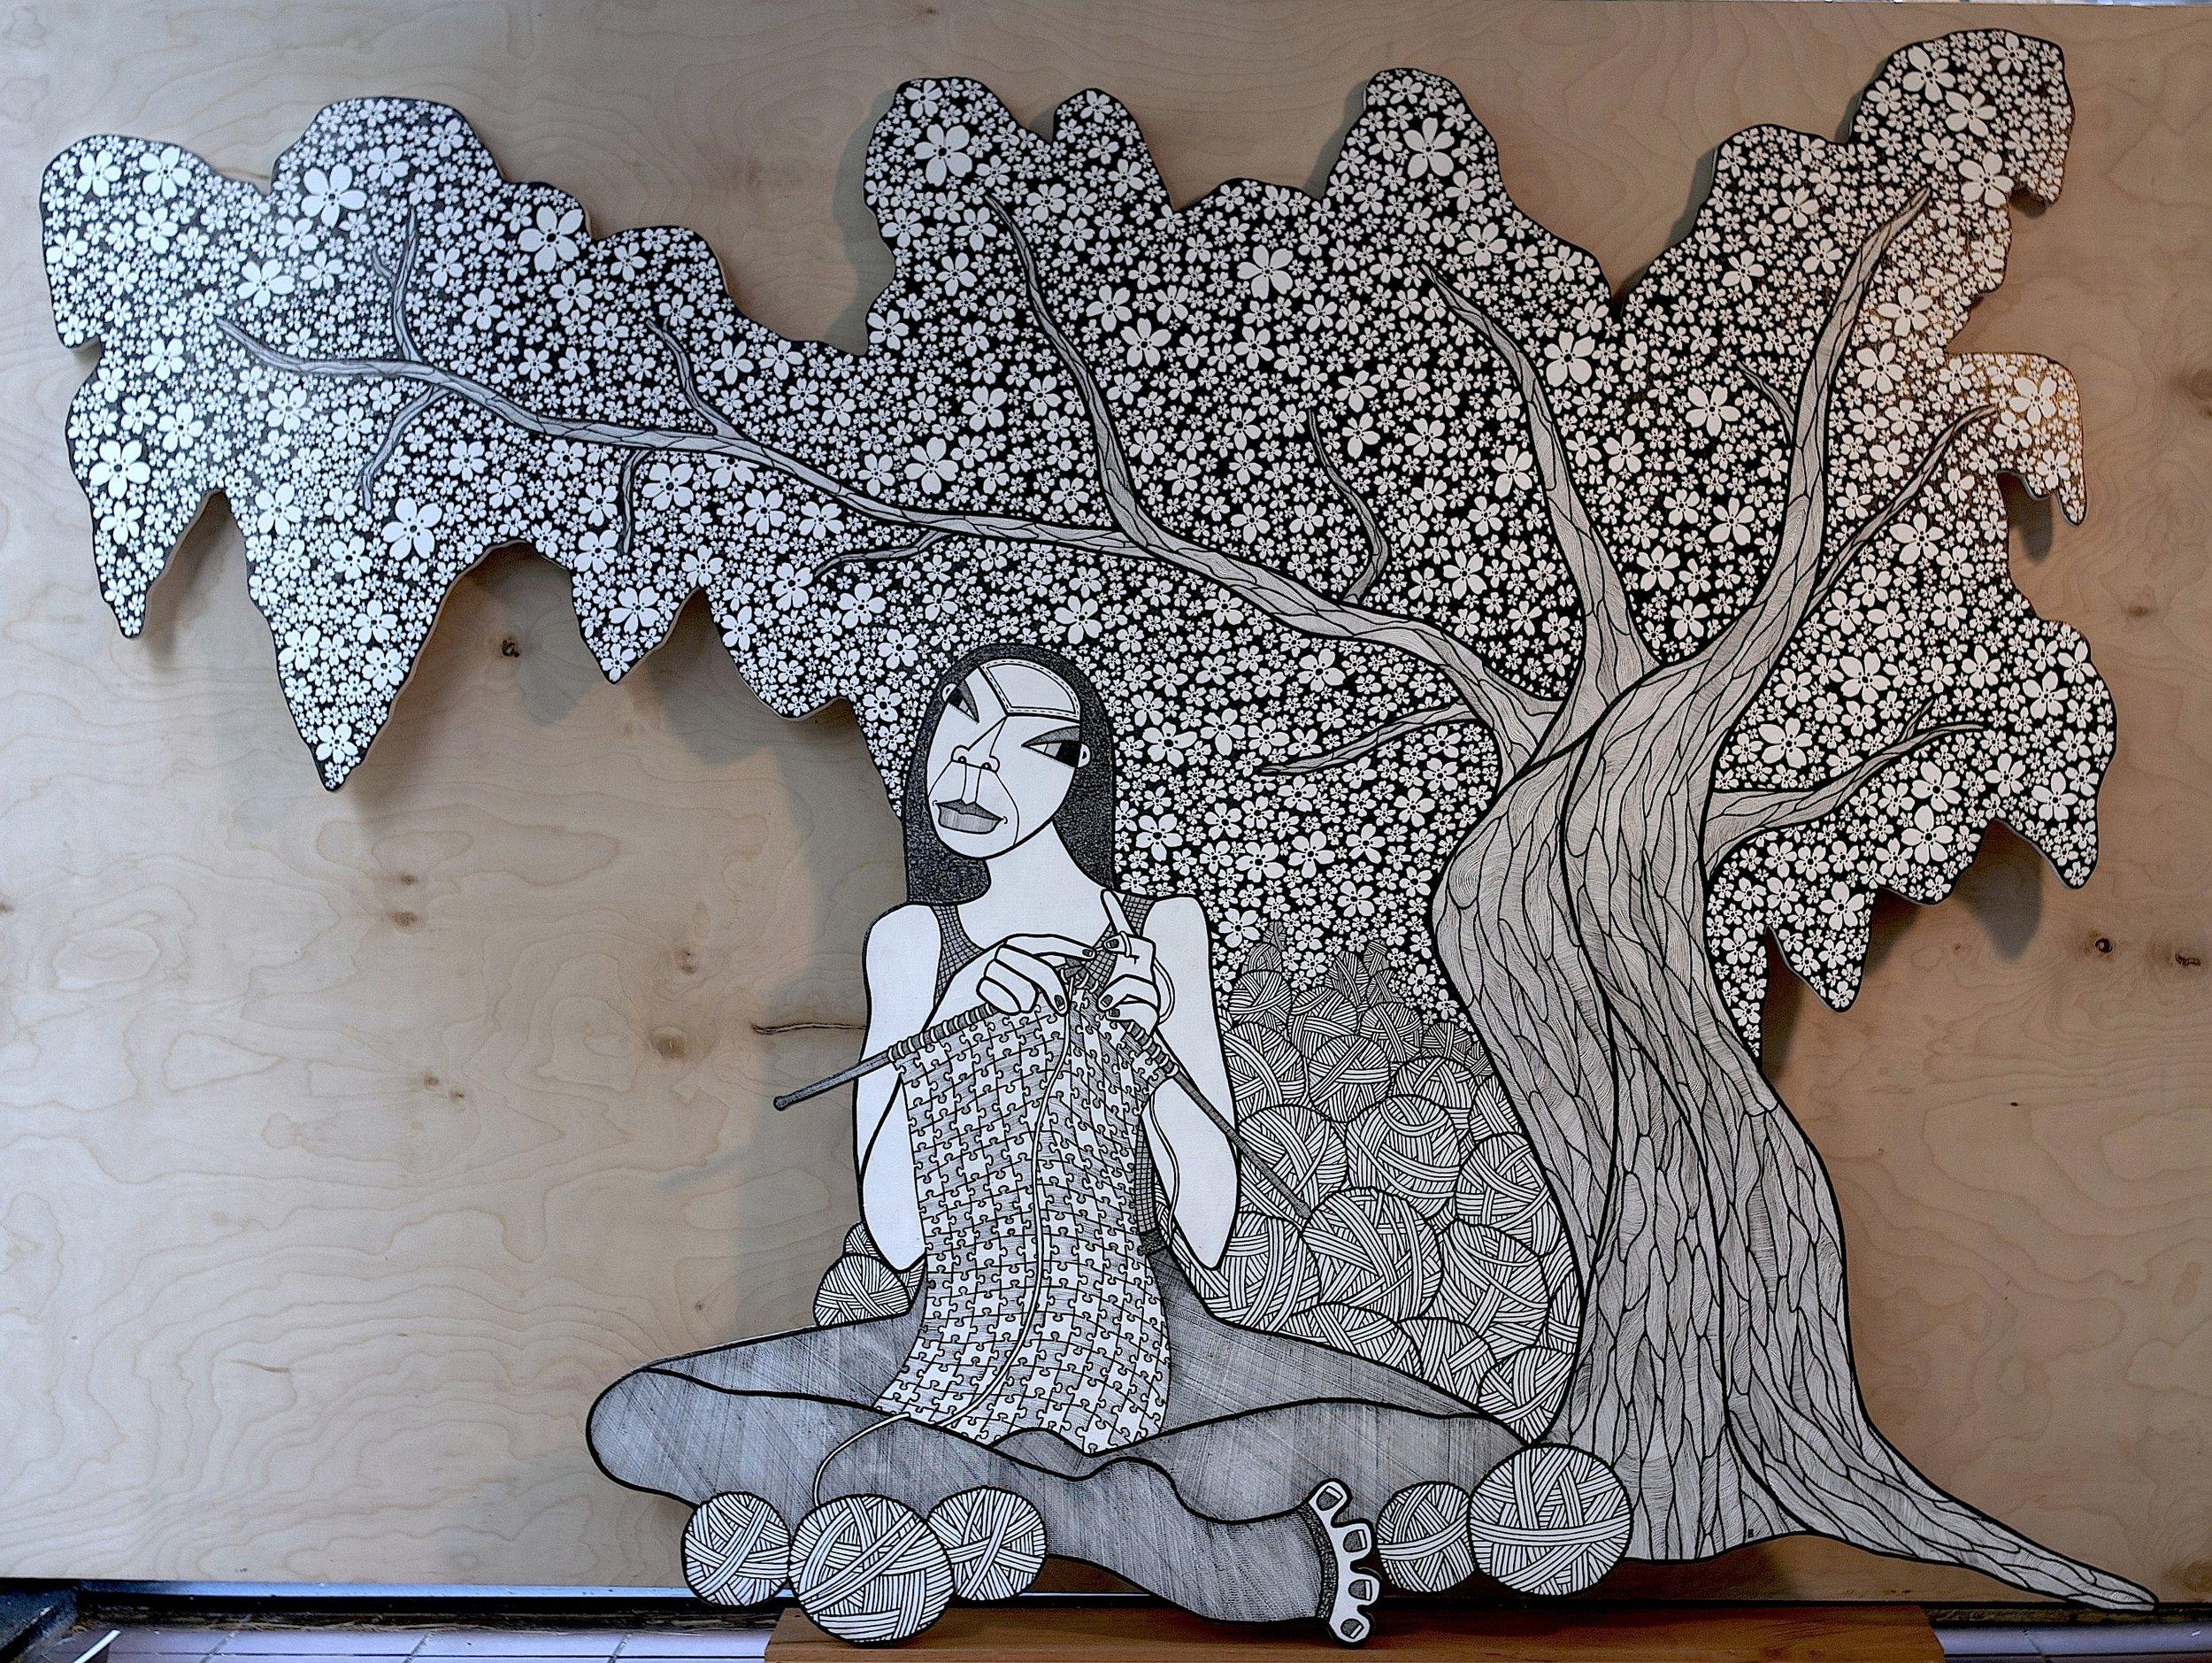 A CBD in D.C. ( A Cherry Blossom Dream in D.C.), ink on birch plywood, 48 x 68 inches, 2014